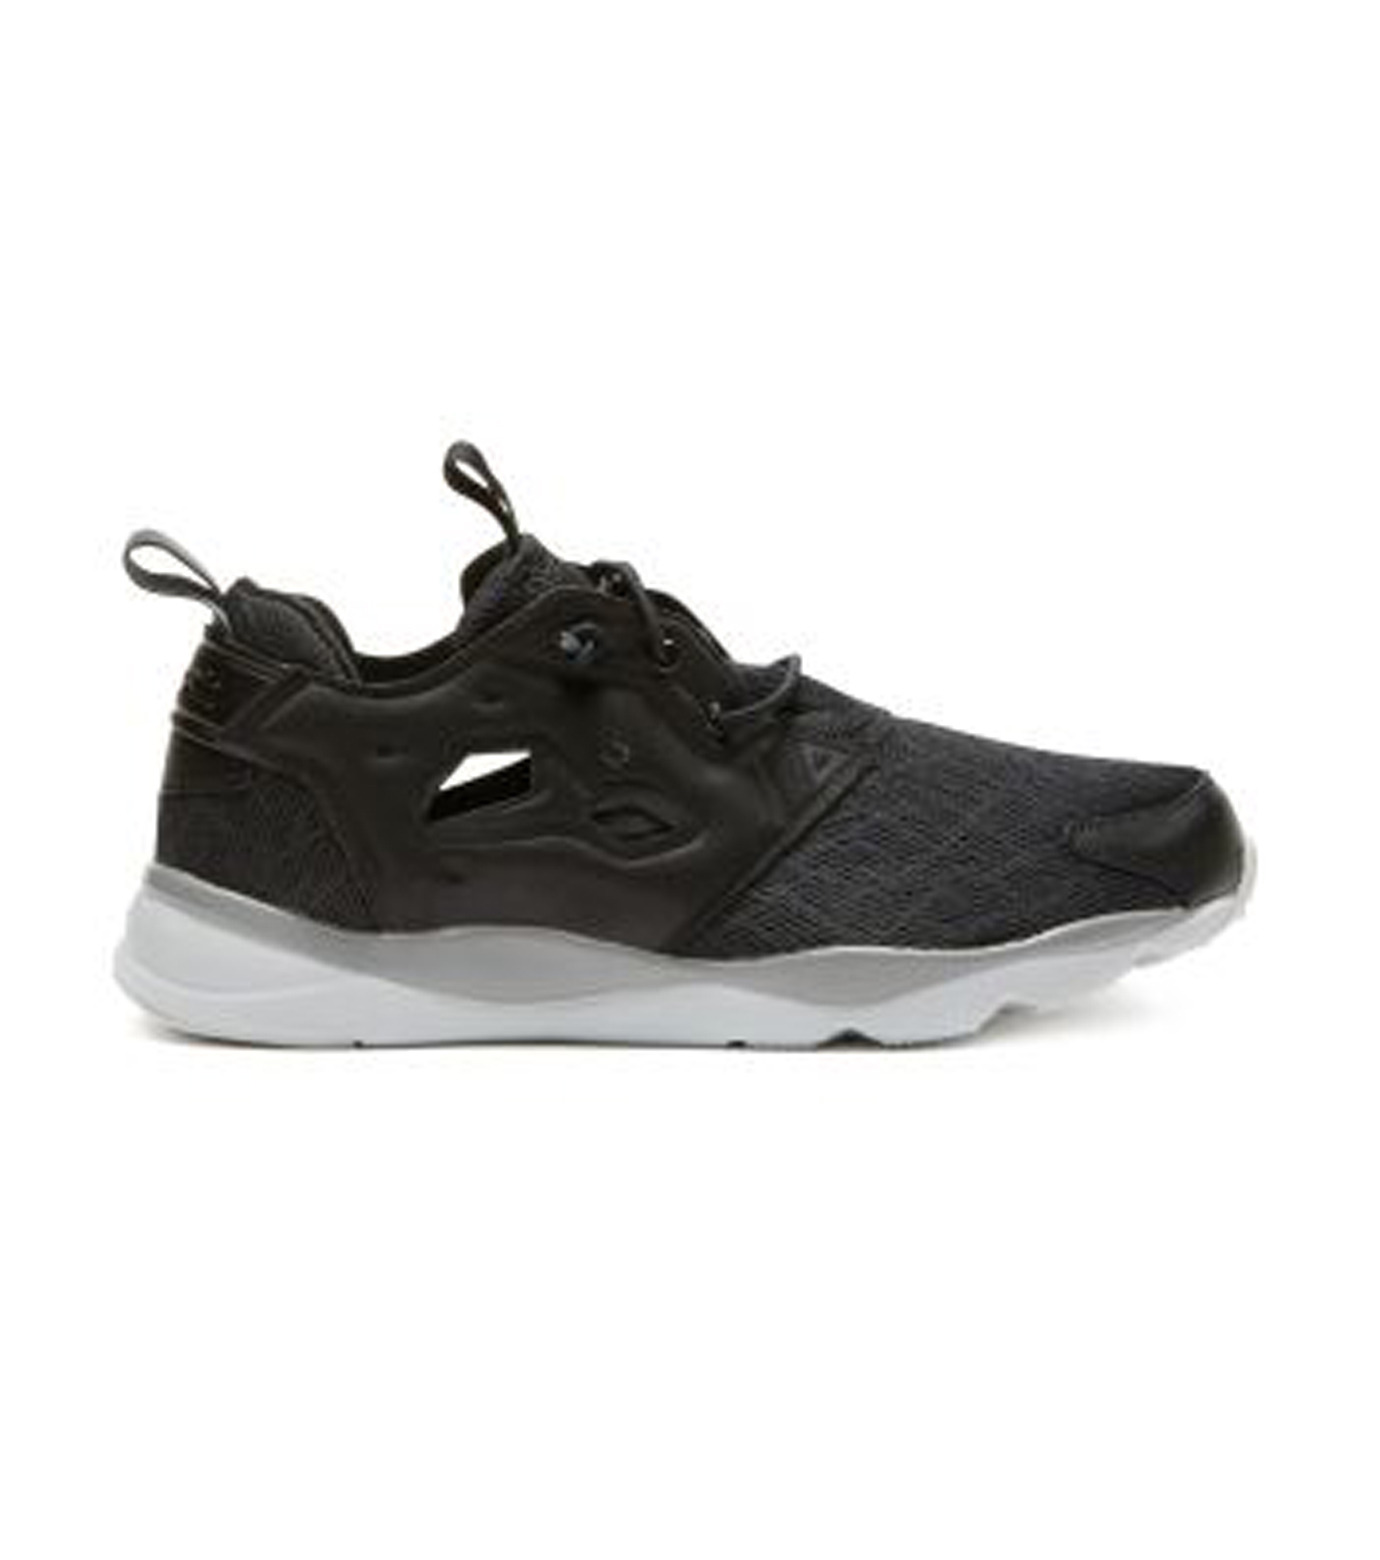 Reebok(リーボック)のFURYLITE TM-BLACK(シューズ/shoes)-V67734-13 拡大詳細画像1